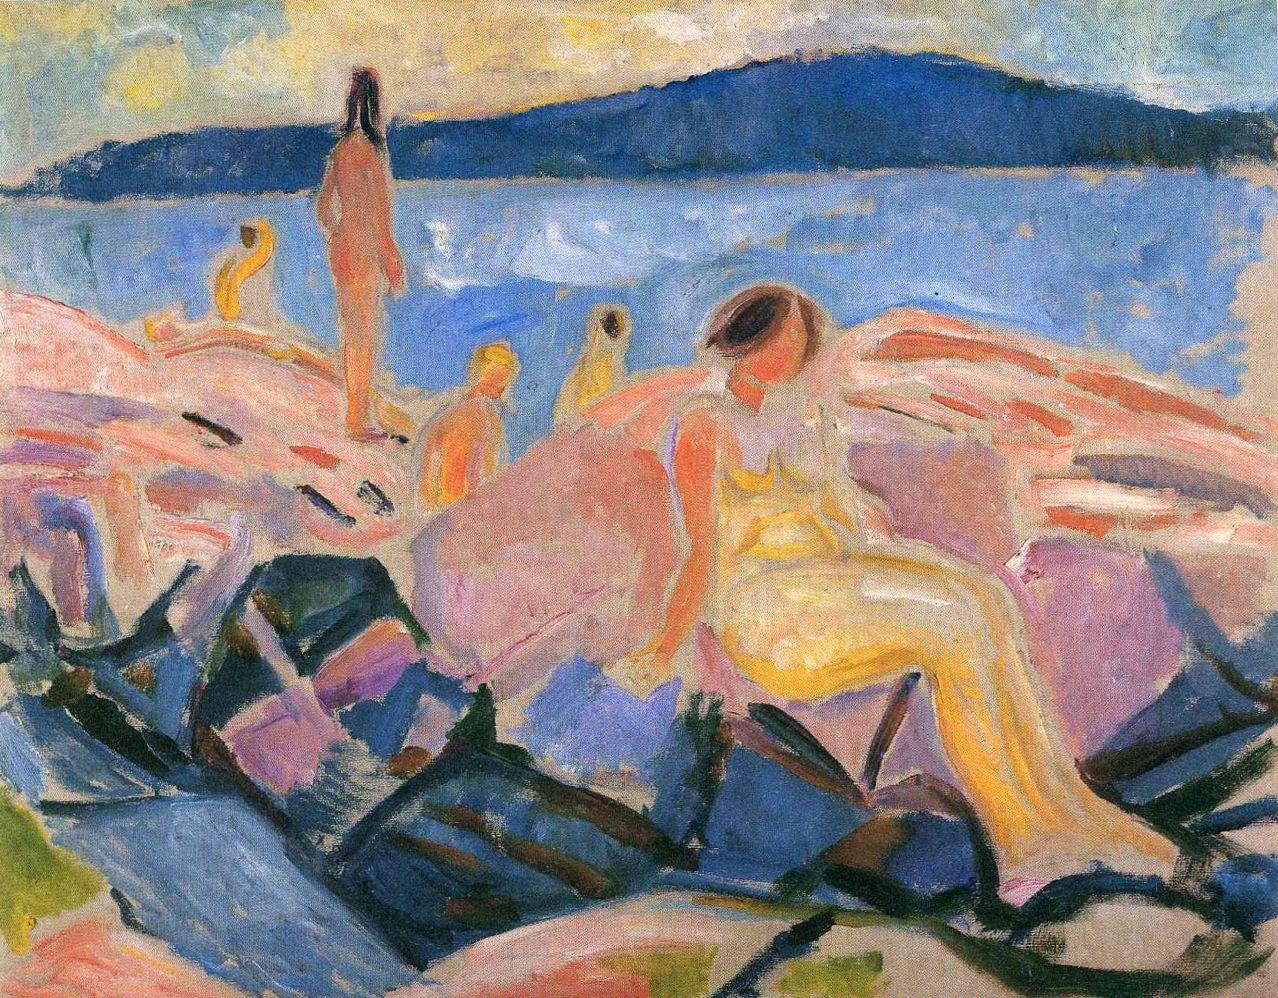 Edvard Munch - High Summer, 1916